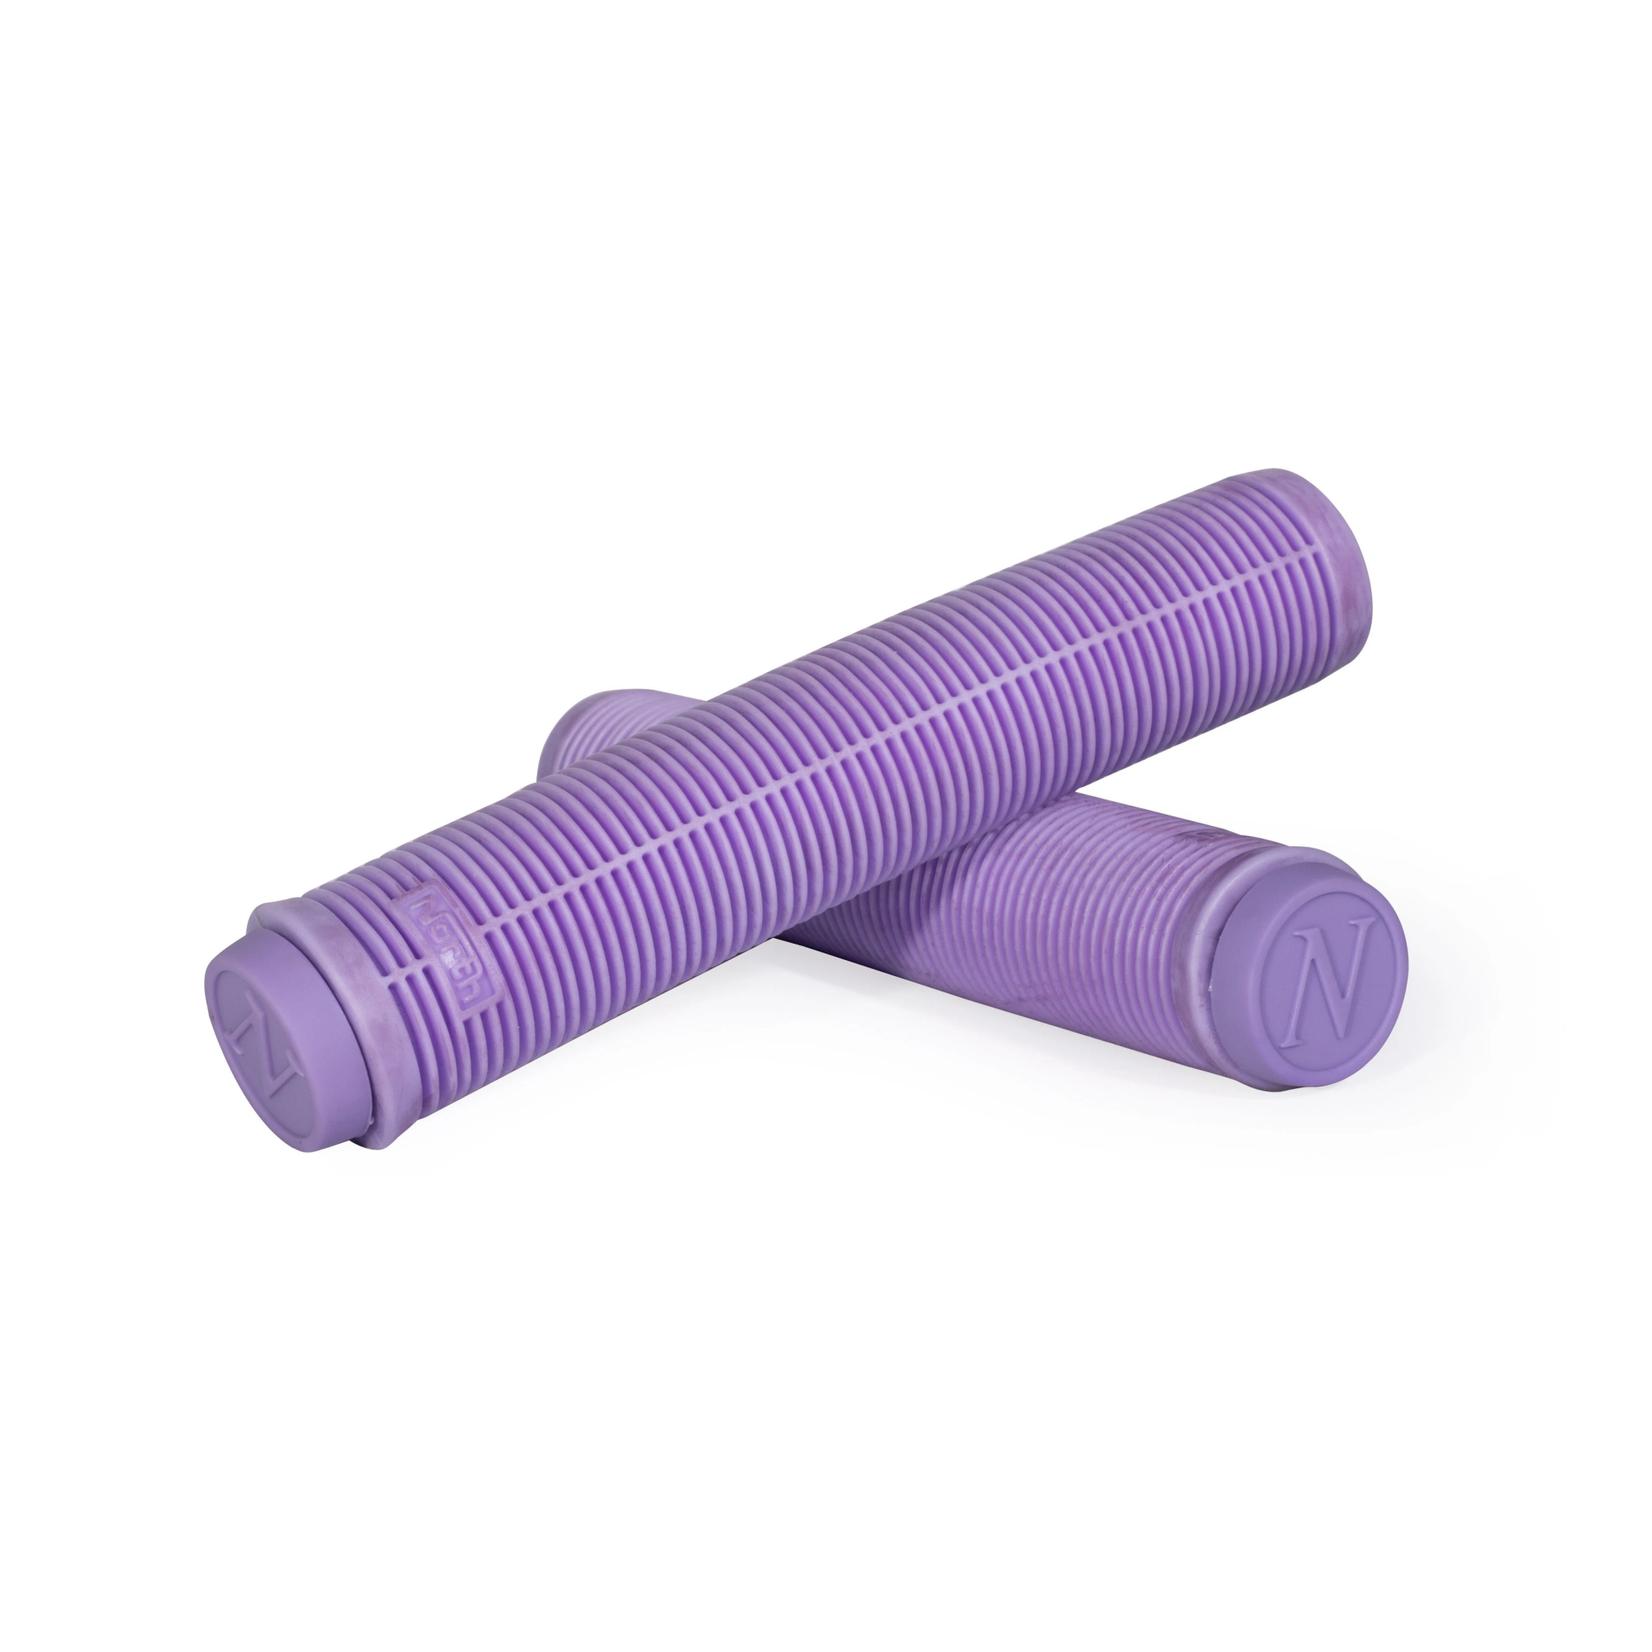 North North - Essential Grips - Purple